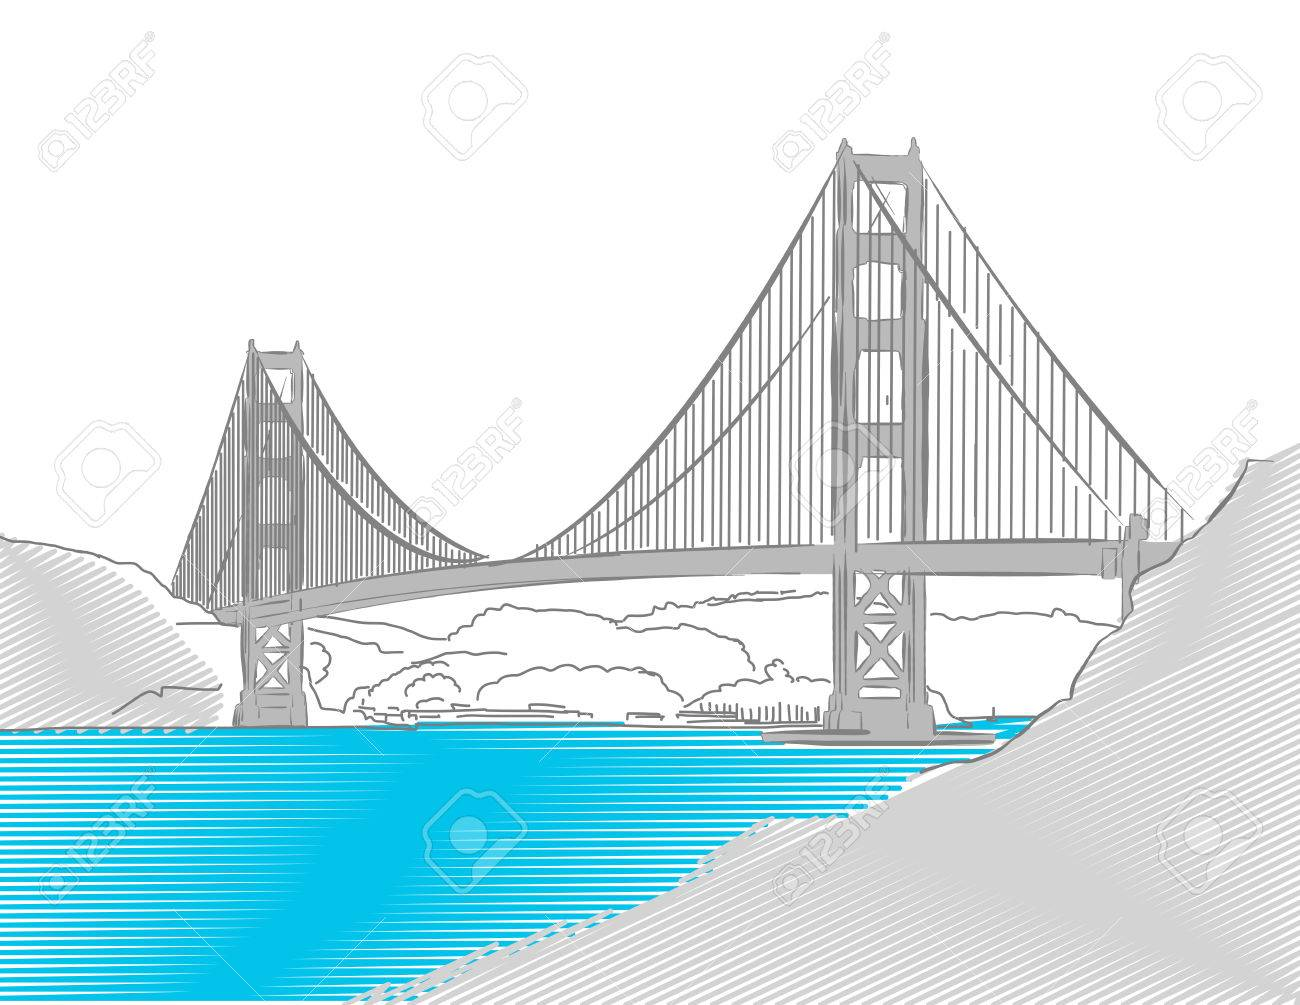 Golden Gate Bridge, San Francisco, Colored Sketch, Hand-drawn Vector Artwork - 58706507